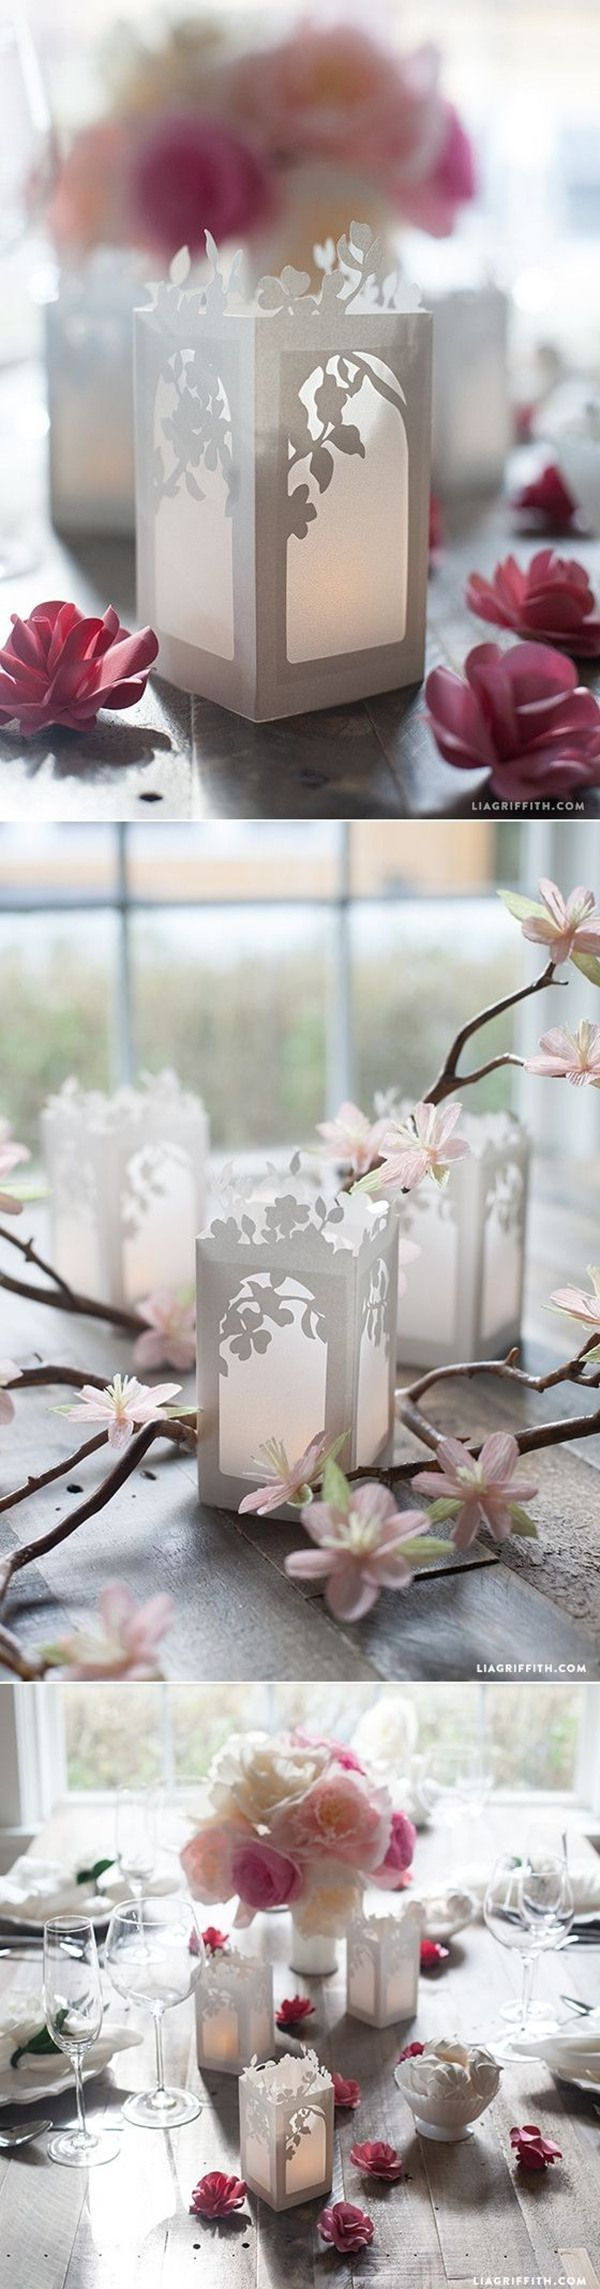 gorgeous DIY wedding centerpieces of paper lanterns